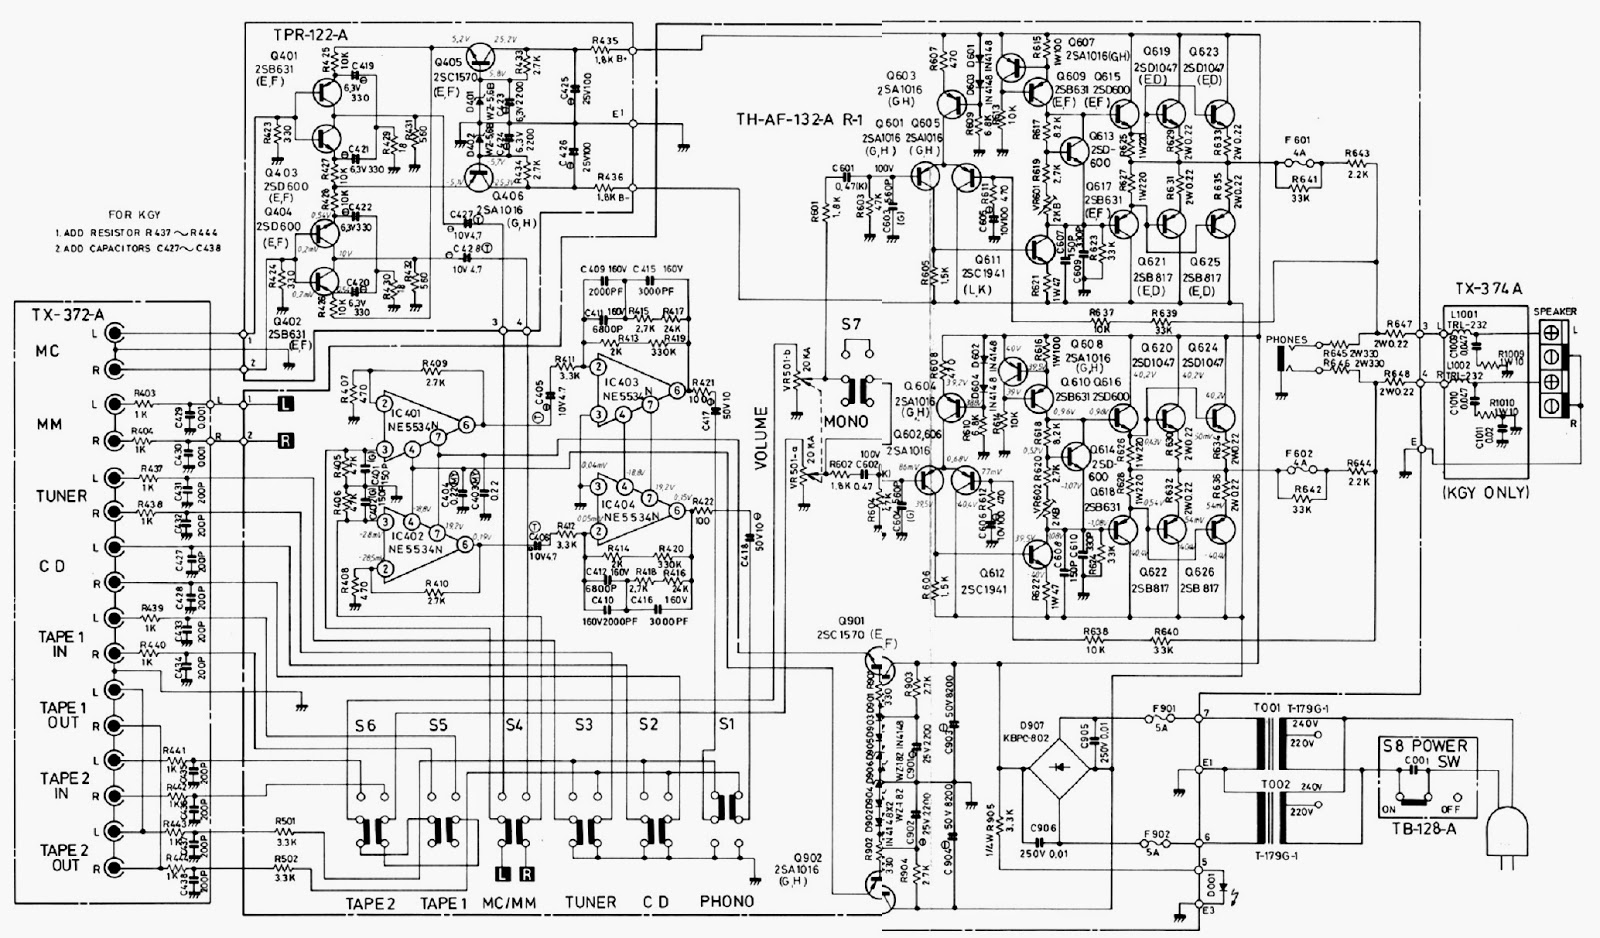 Spa Electrical Circuit Diagrams Schematic Ug412rmw250p Wiring Diagram Balboa Pack Cal Formulas